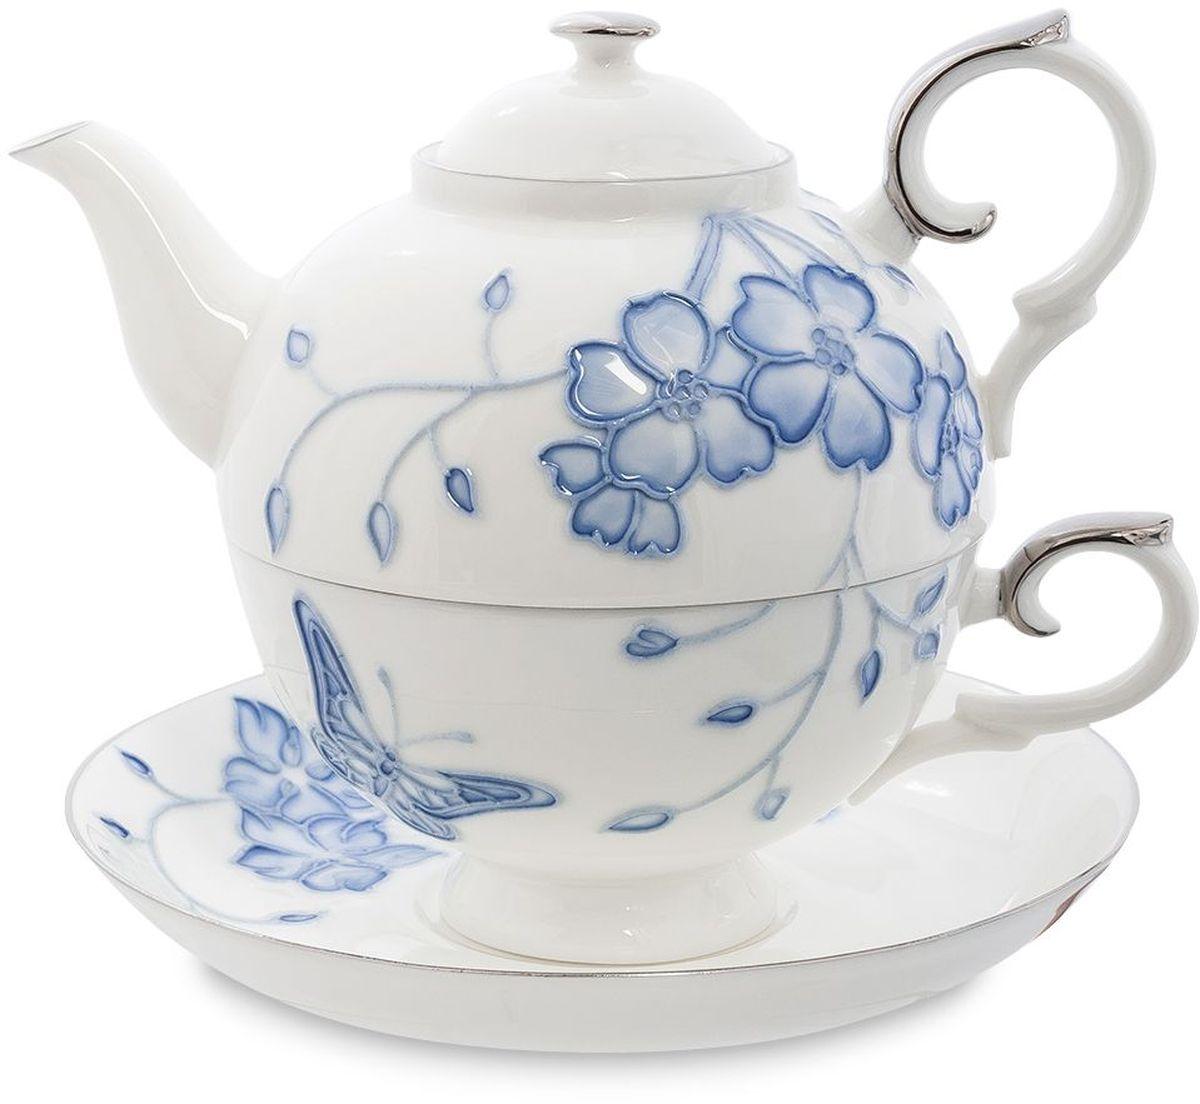 Набор чайный Pavone Голубая бабочка, 3 предмета. 451604115510Объем чайника: 400 млОбъем чаши: 250 млДиаметр блюдца: 15 см